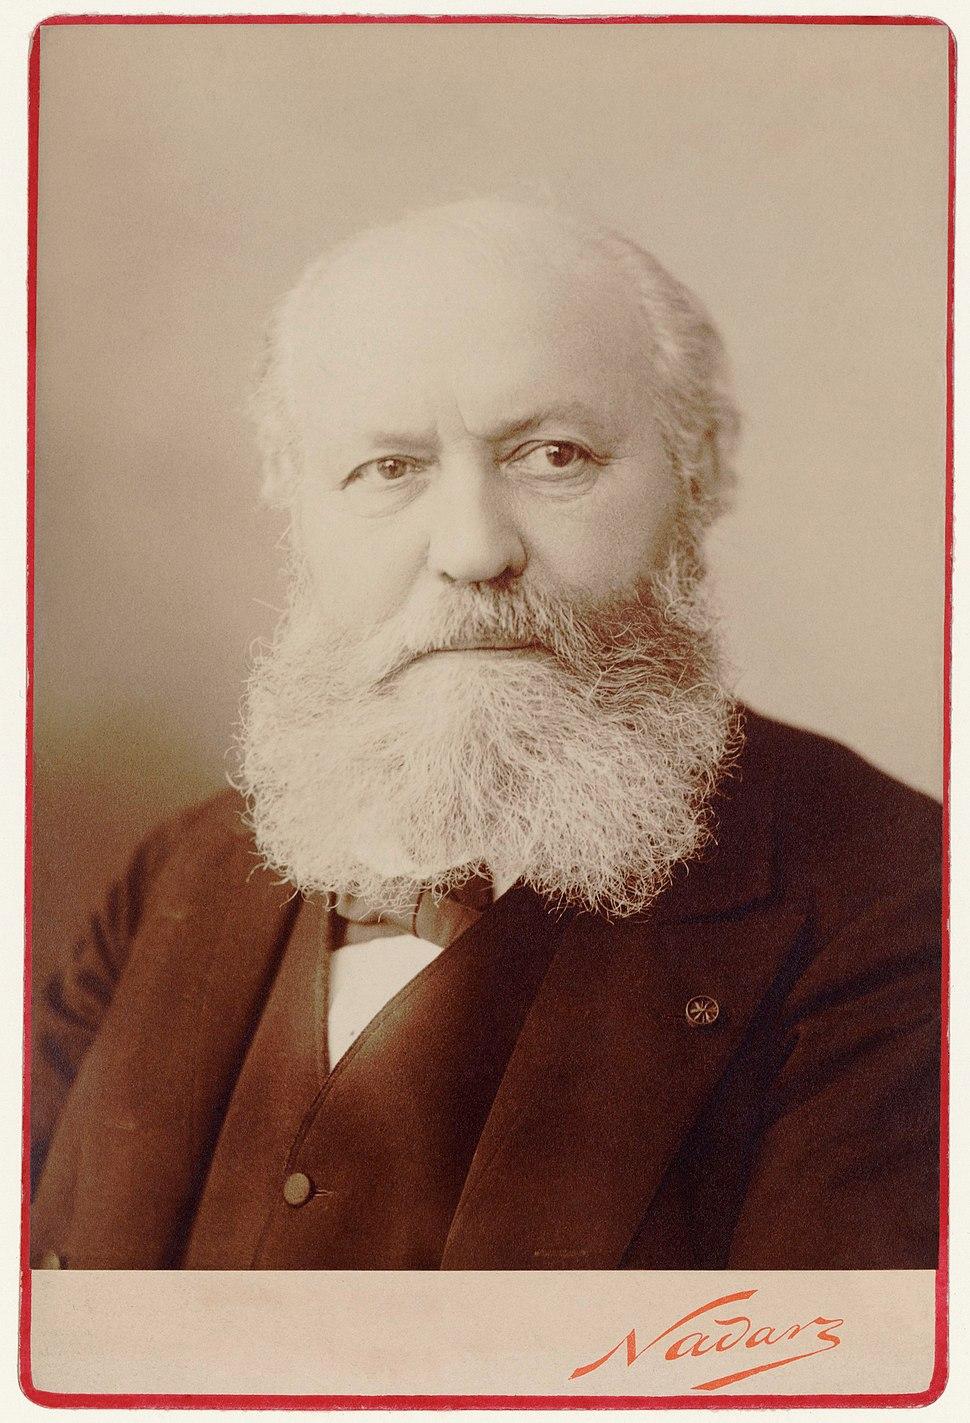 Charles Gounod (1890) by Nadar